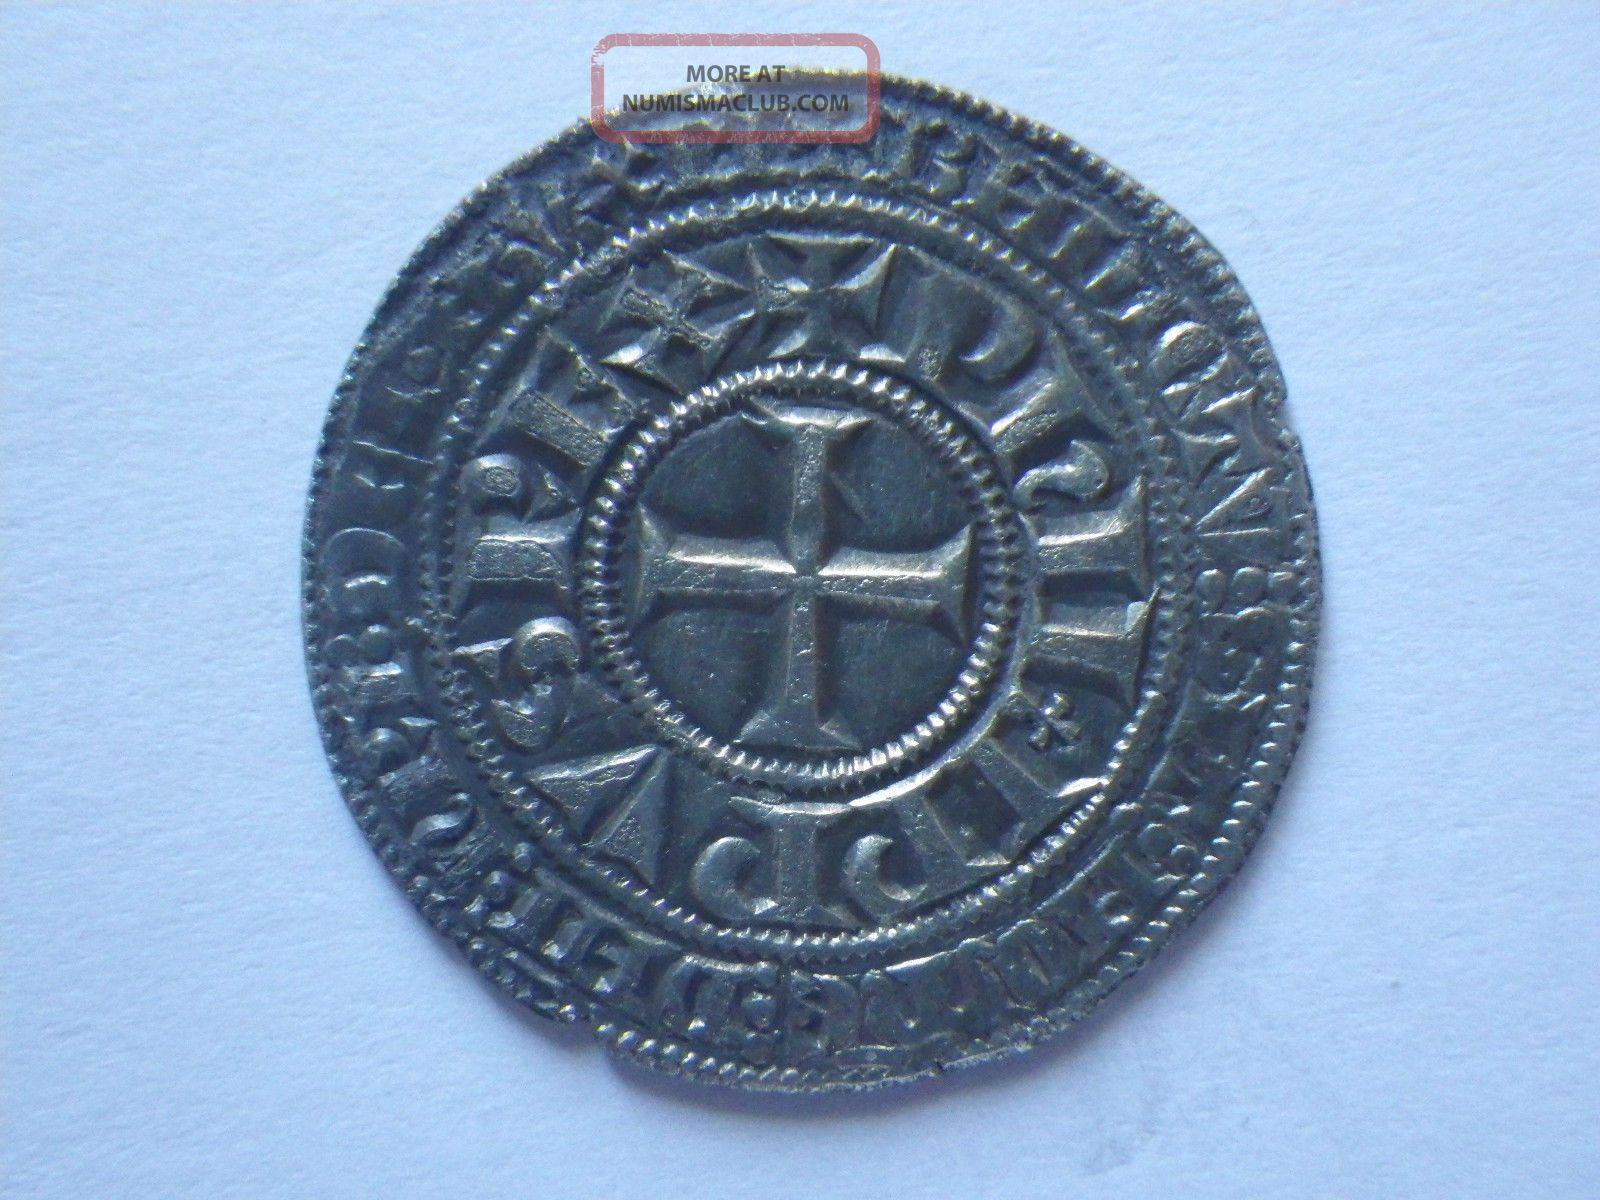 France Silver Gros Tournois Philip Iv The Fair 1290 - 1295 Ad 3.  82 Grams Long 0 Europe photo